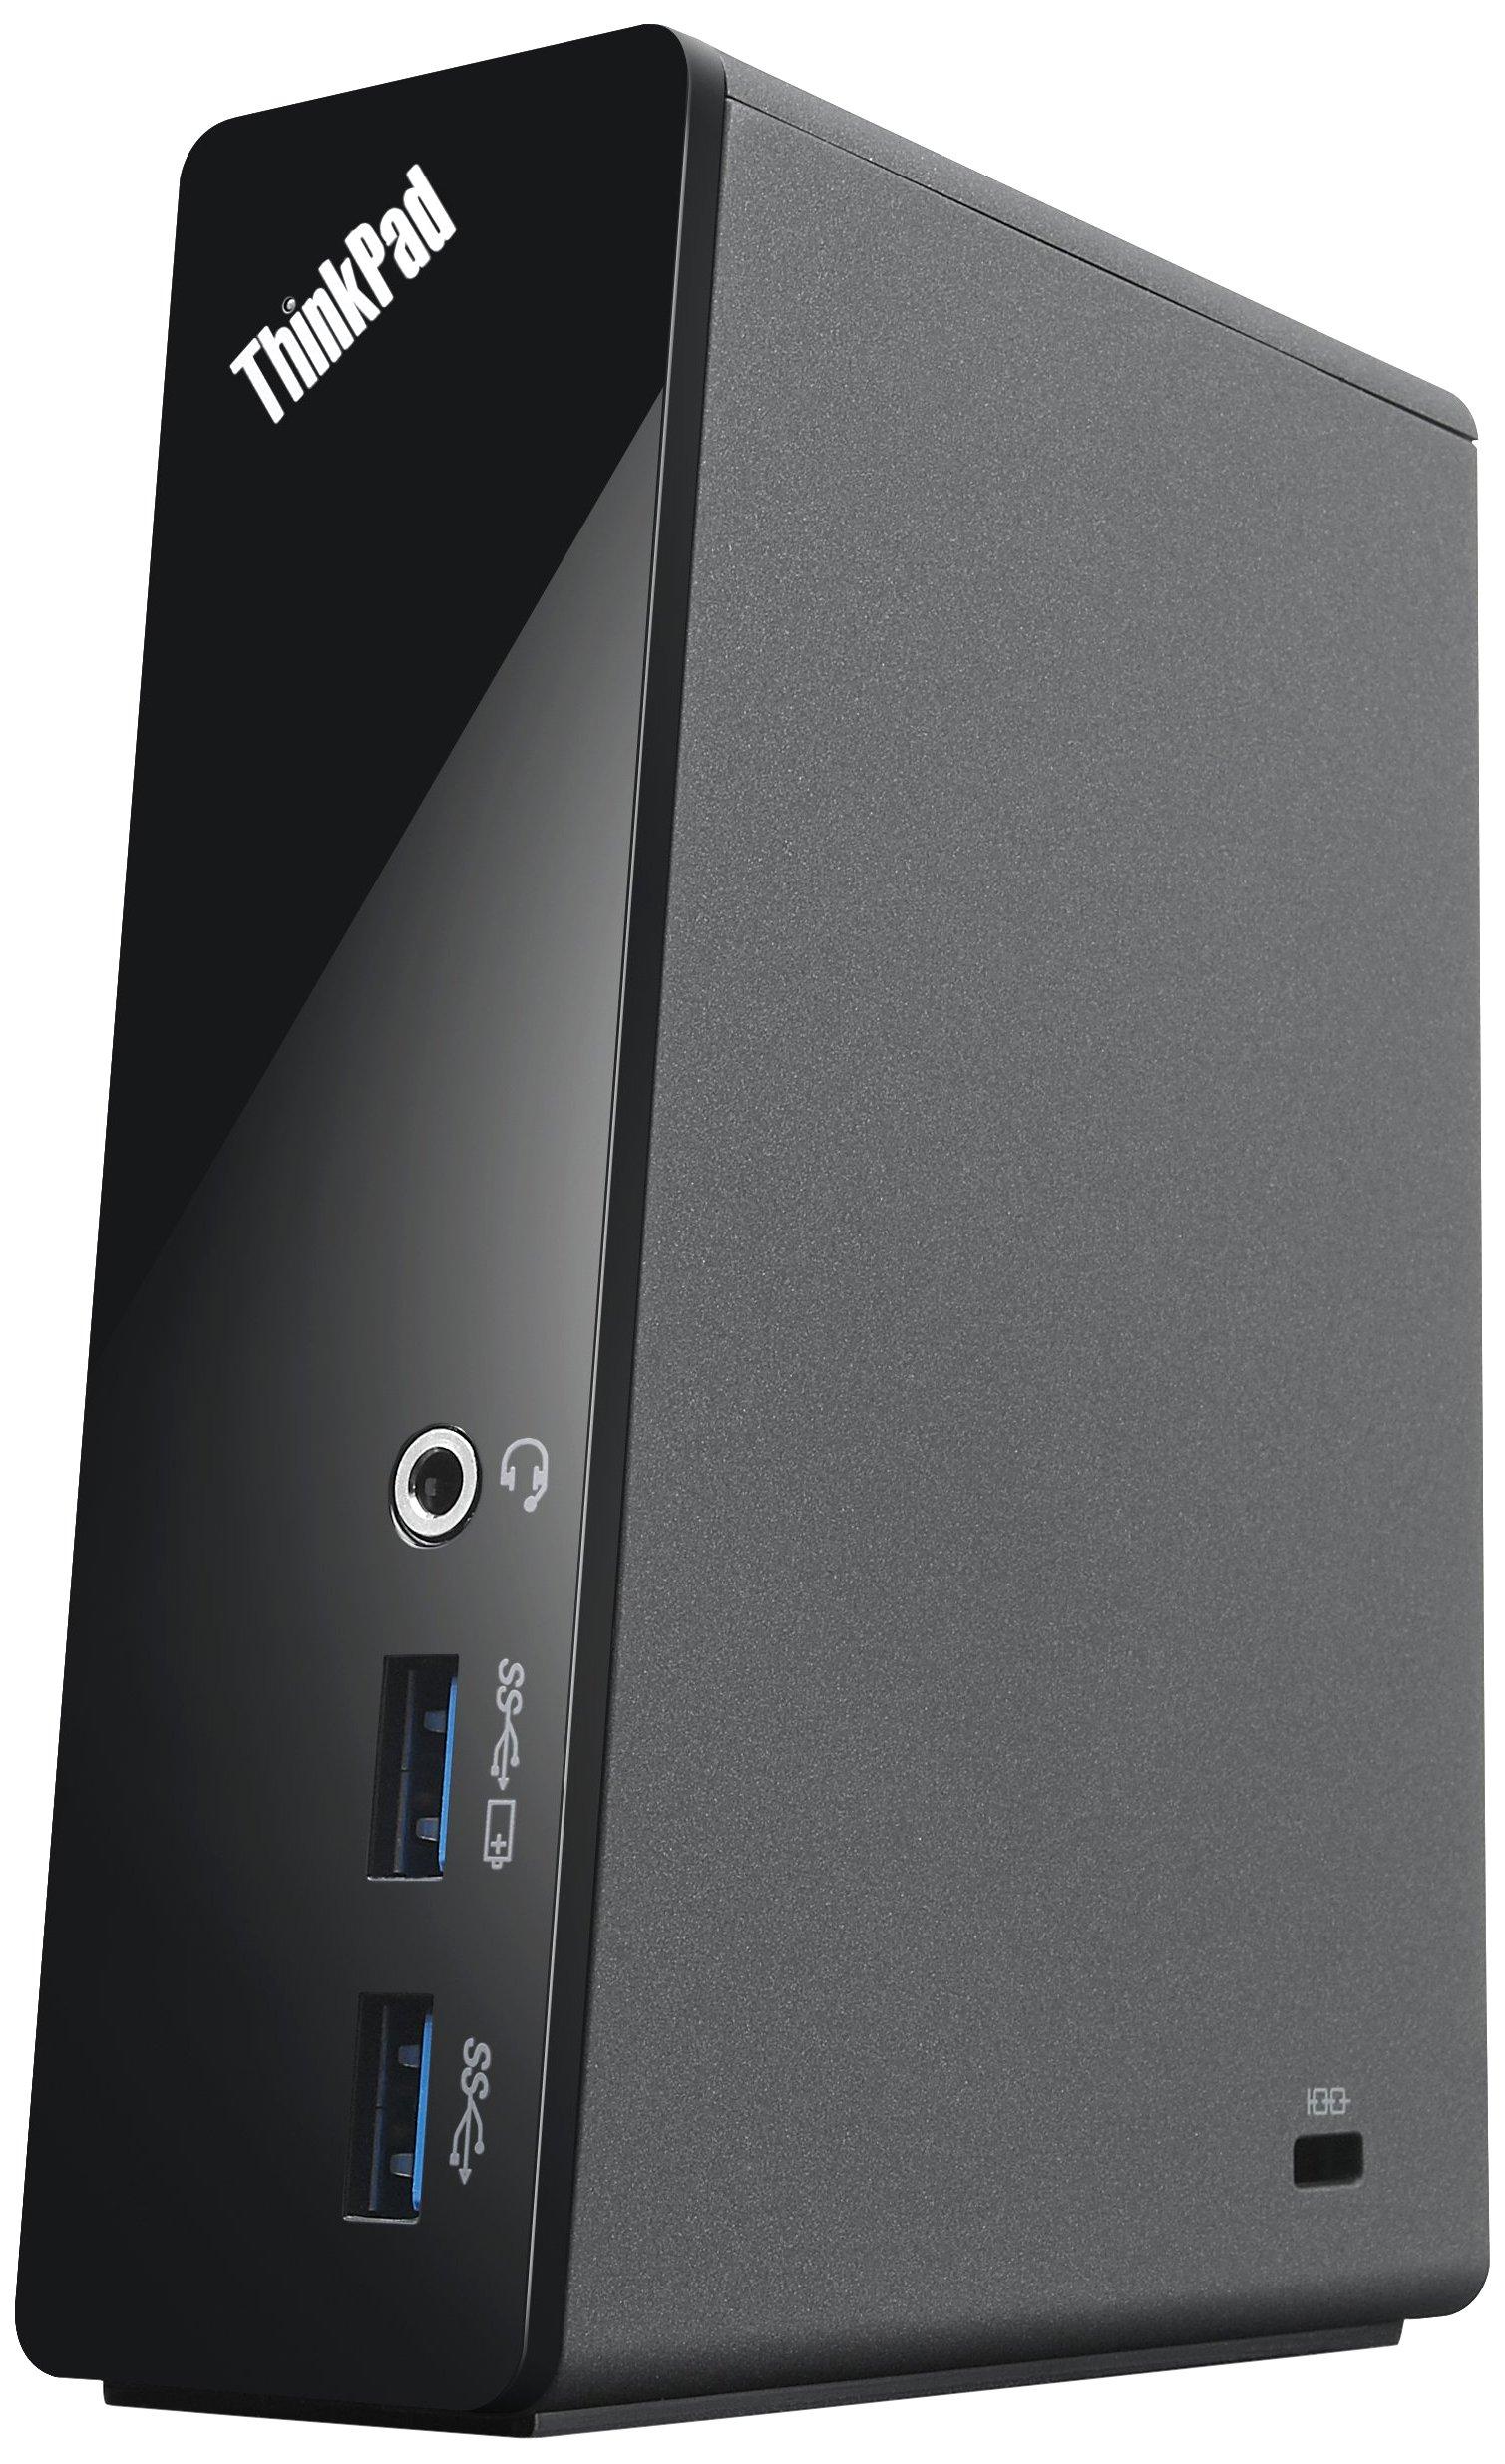 Lenovo ThinkPad One Link Dock (4X10A06077) by Lenovo